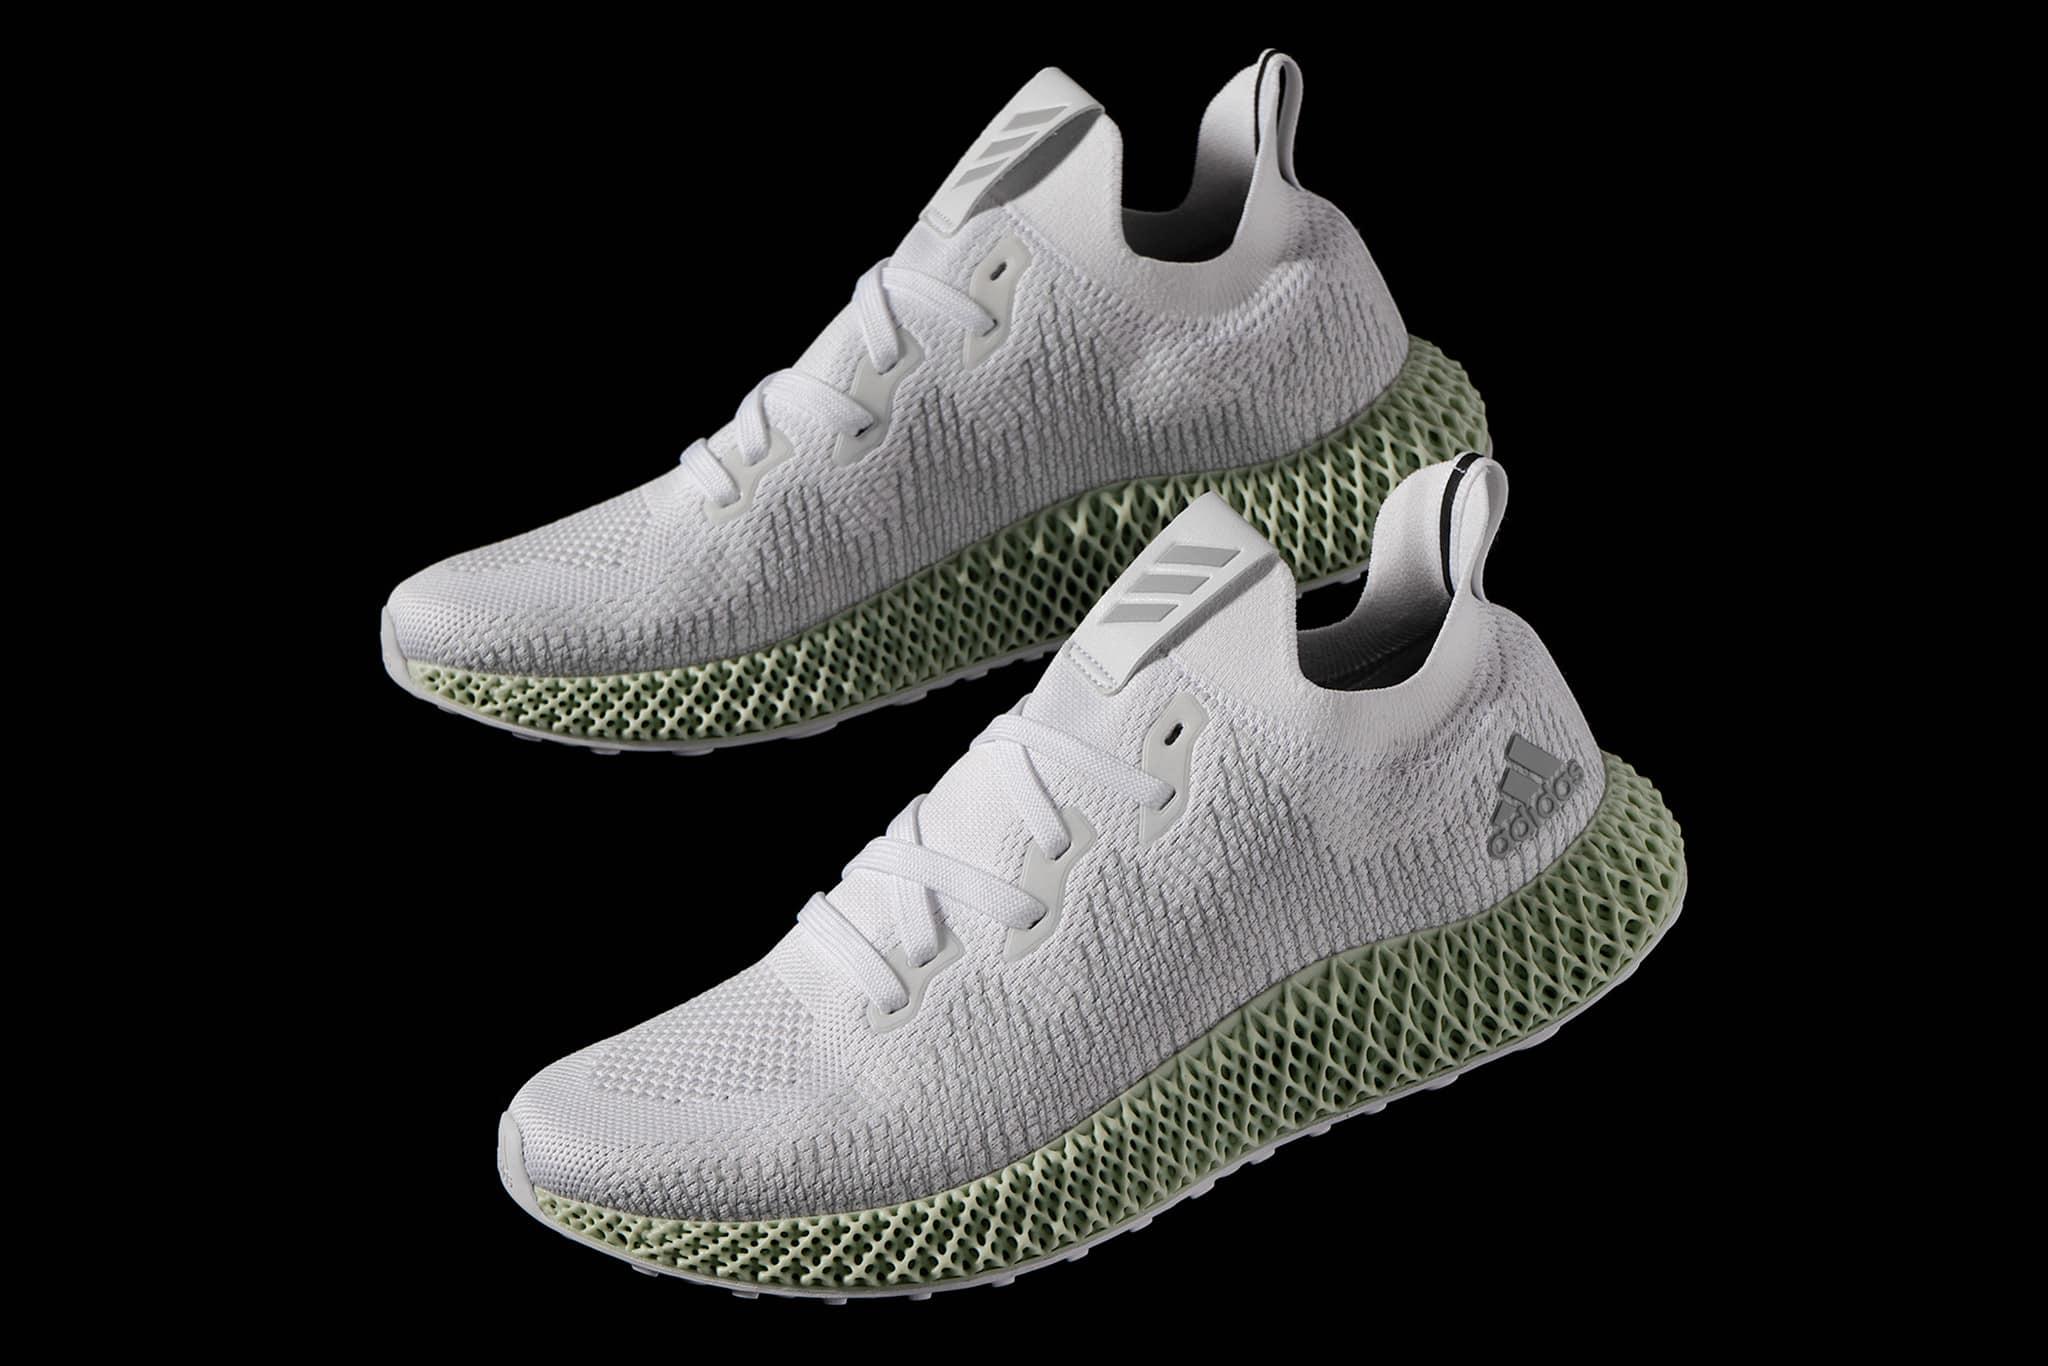 detailed look bfb57 70fe6 HAVEN-adidas-alphaedge-4D-WHITE-FW18-November-News-Webl92rc1.jpg